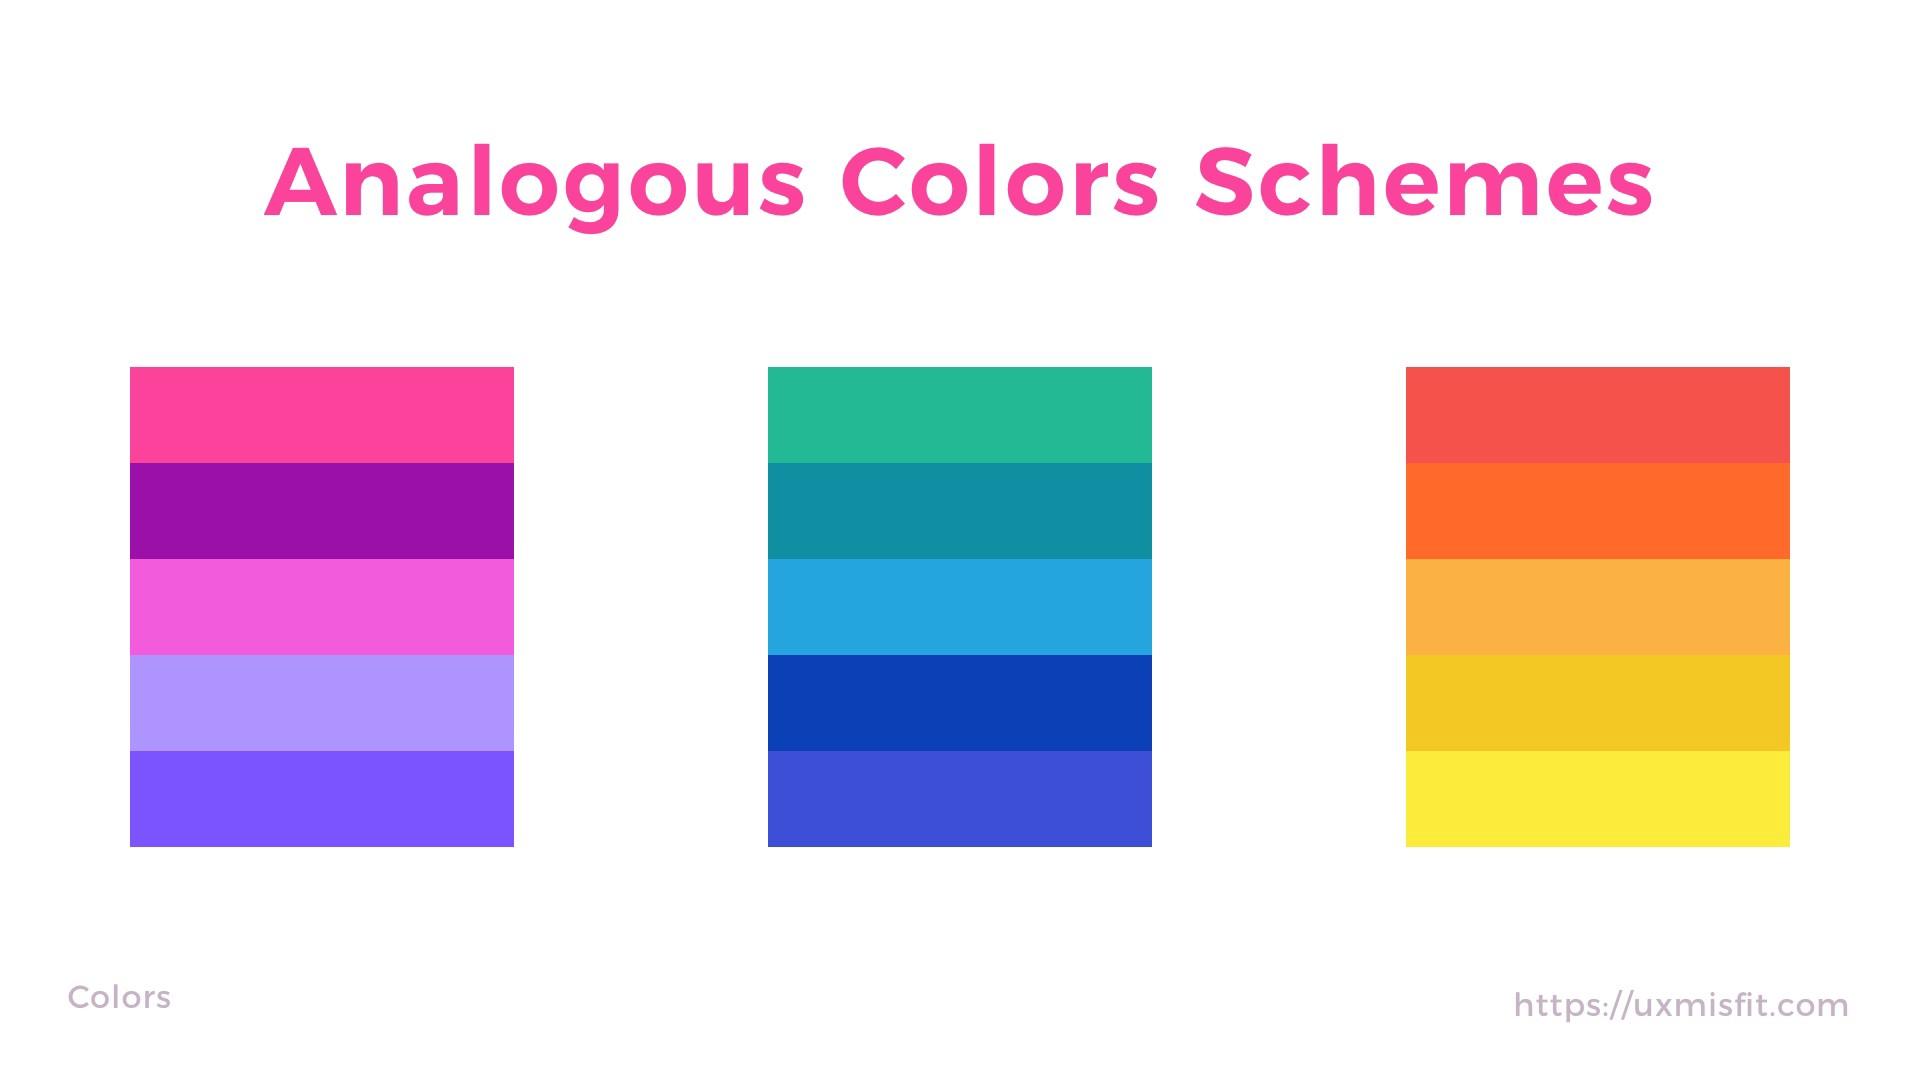 近似色配色法 Analogous colors